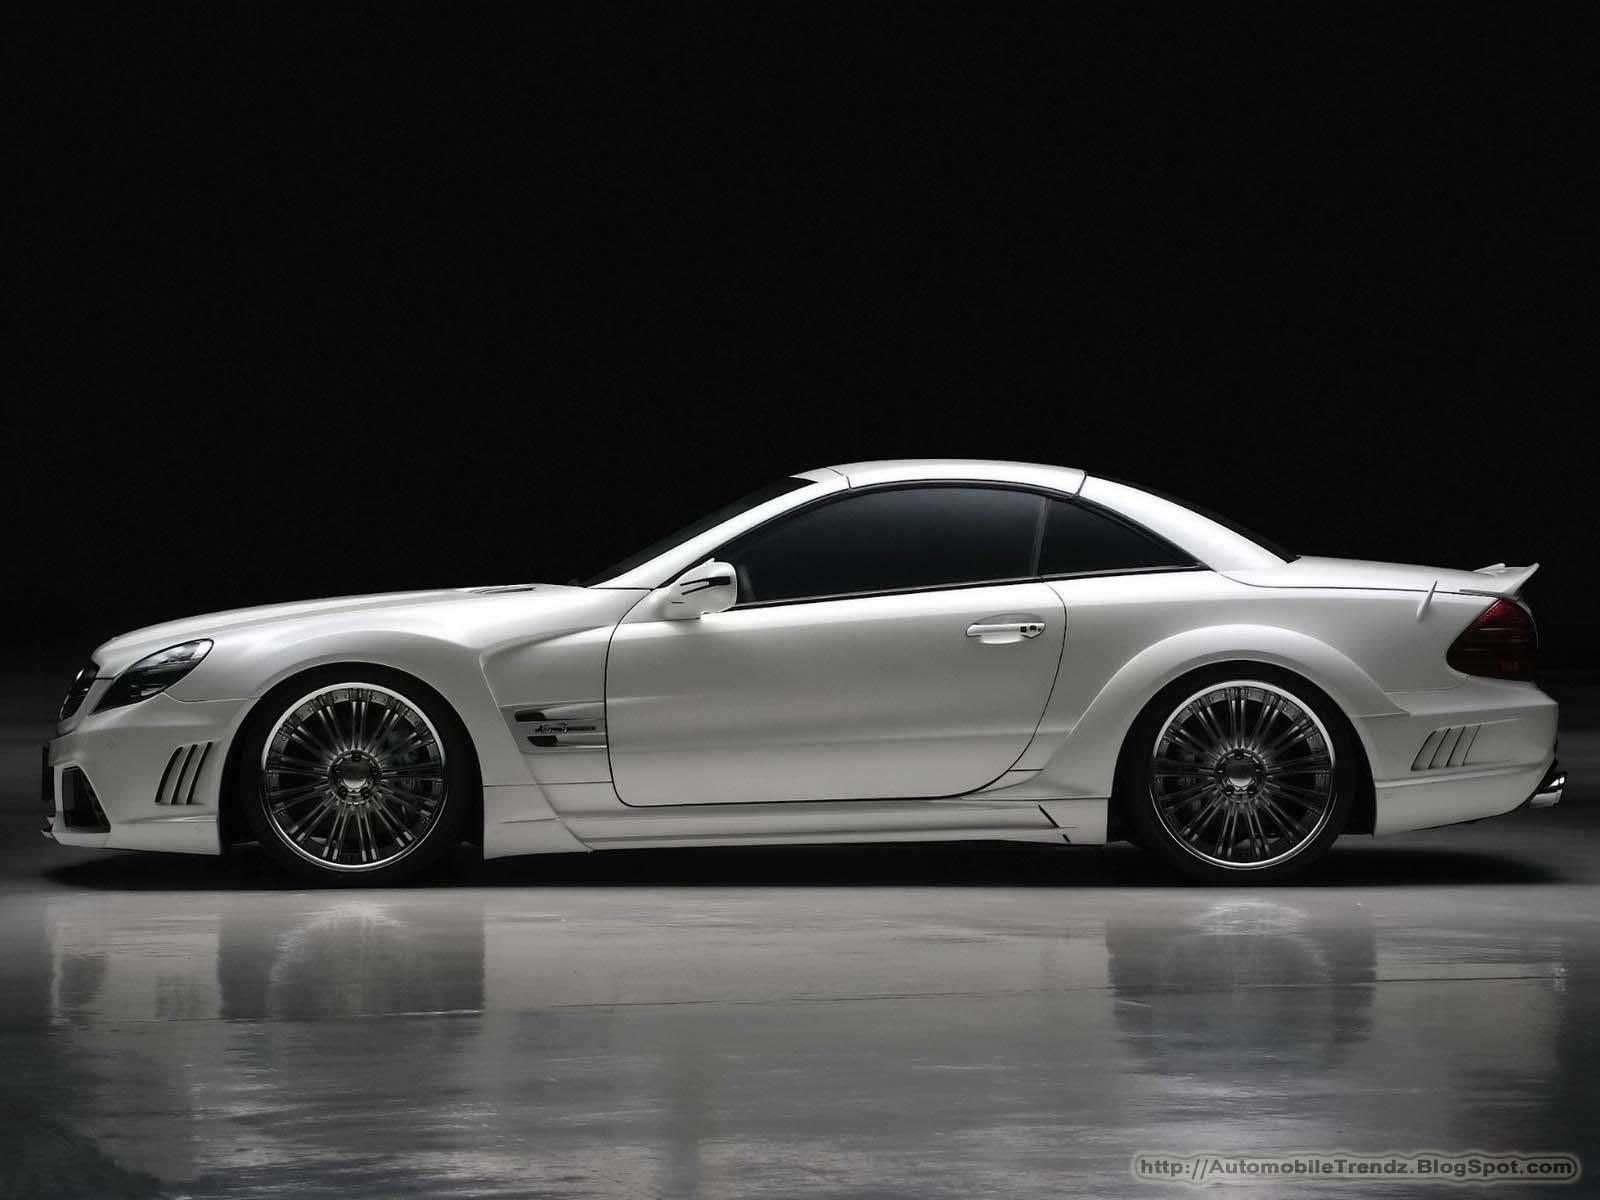 http://4.bp.blogspot.com/-q-NRP8_Wt6Q/UUcZpVTGUsI/AAAAAAAAVQs/23IrIzH0FHU/s1600/Mercedes-Benz%2BSL%2B63%2BAMG%2BBlack%2BBison%2BEdition.jpg